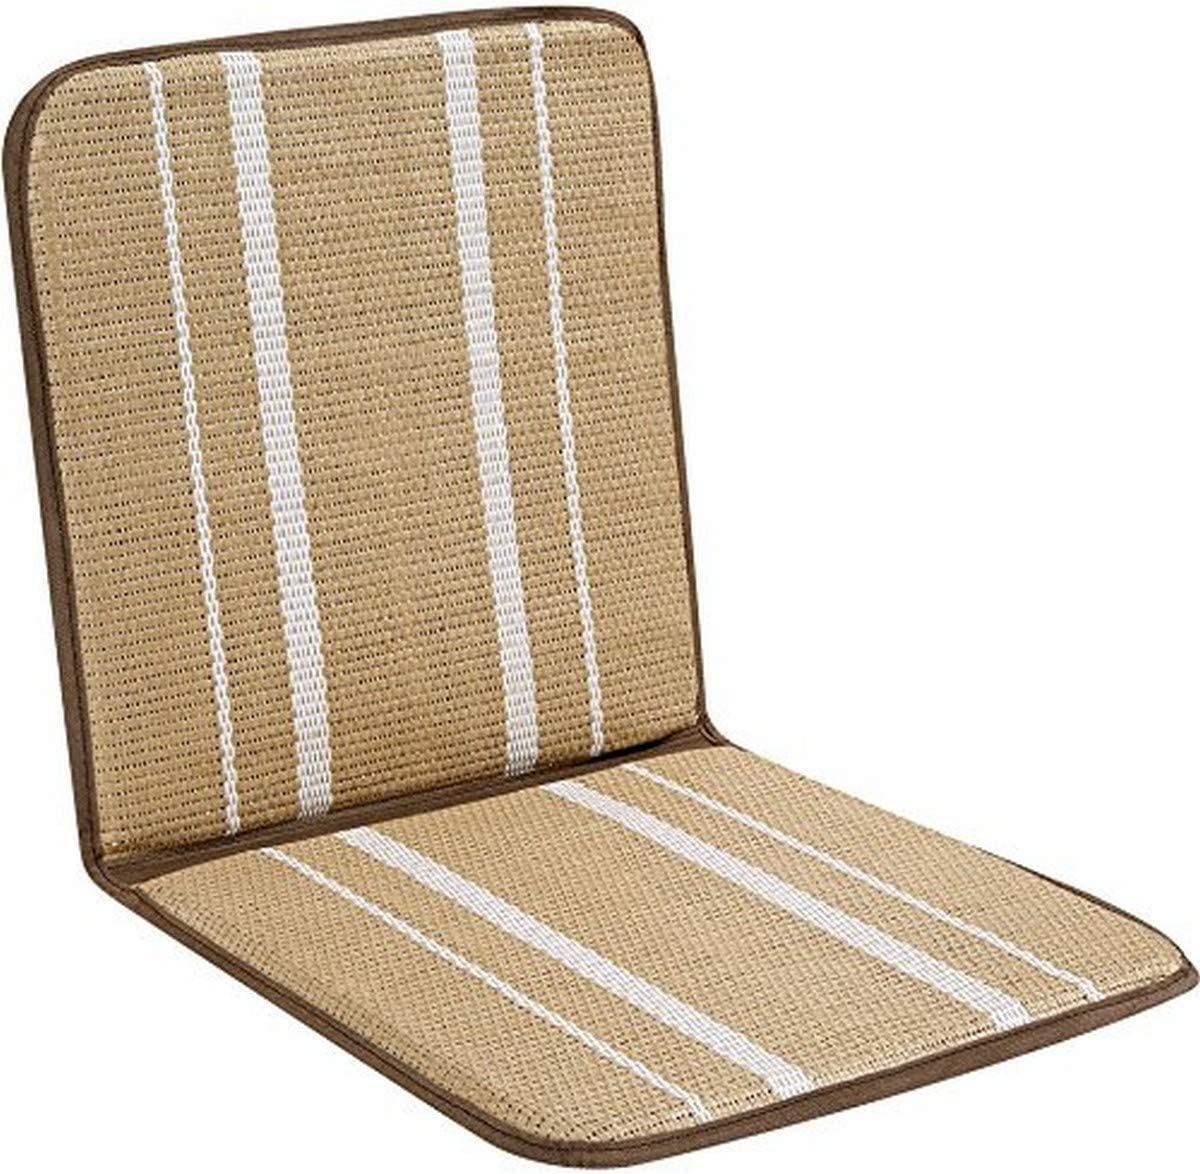 Kool Kooshion Standard Size Ventilated Seat Cushion, Beige